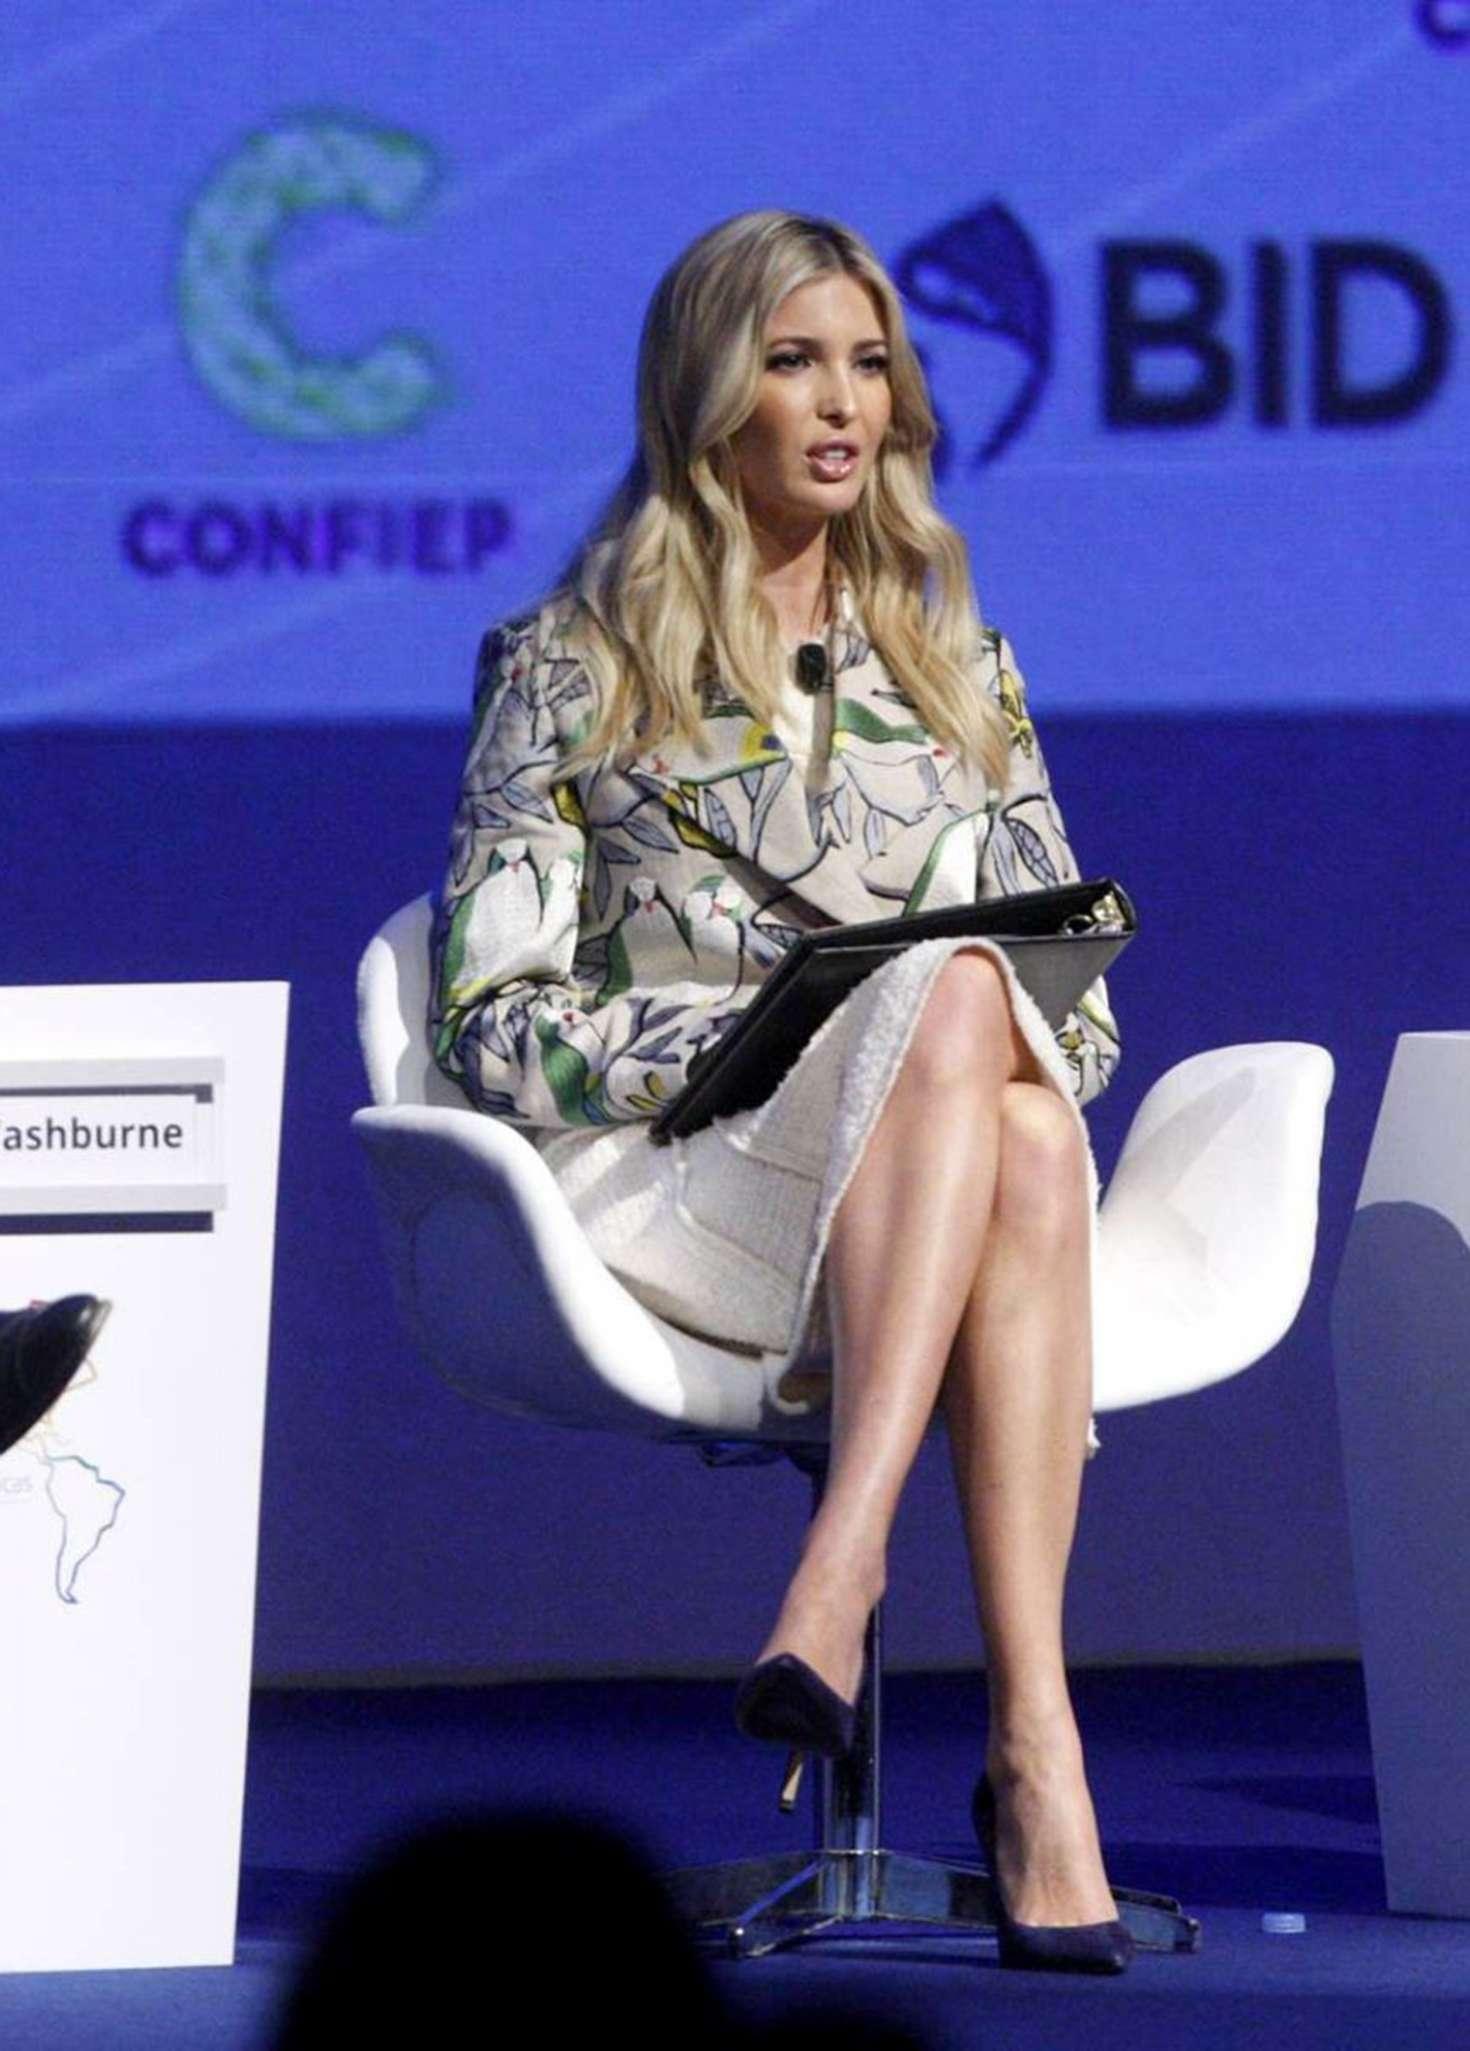 Ivanka Trump - III Summit of the Americas CEO in Lima